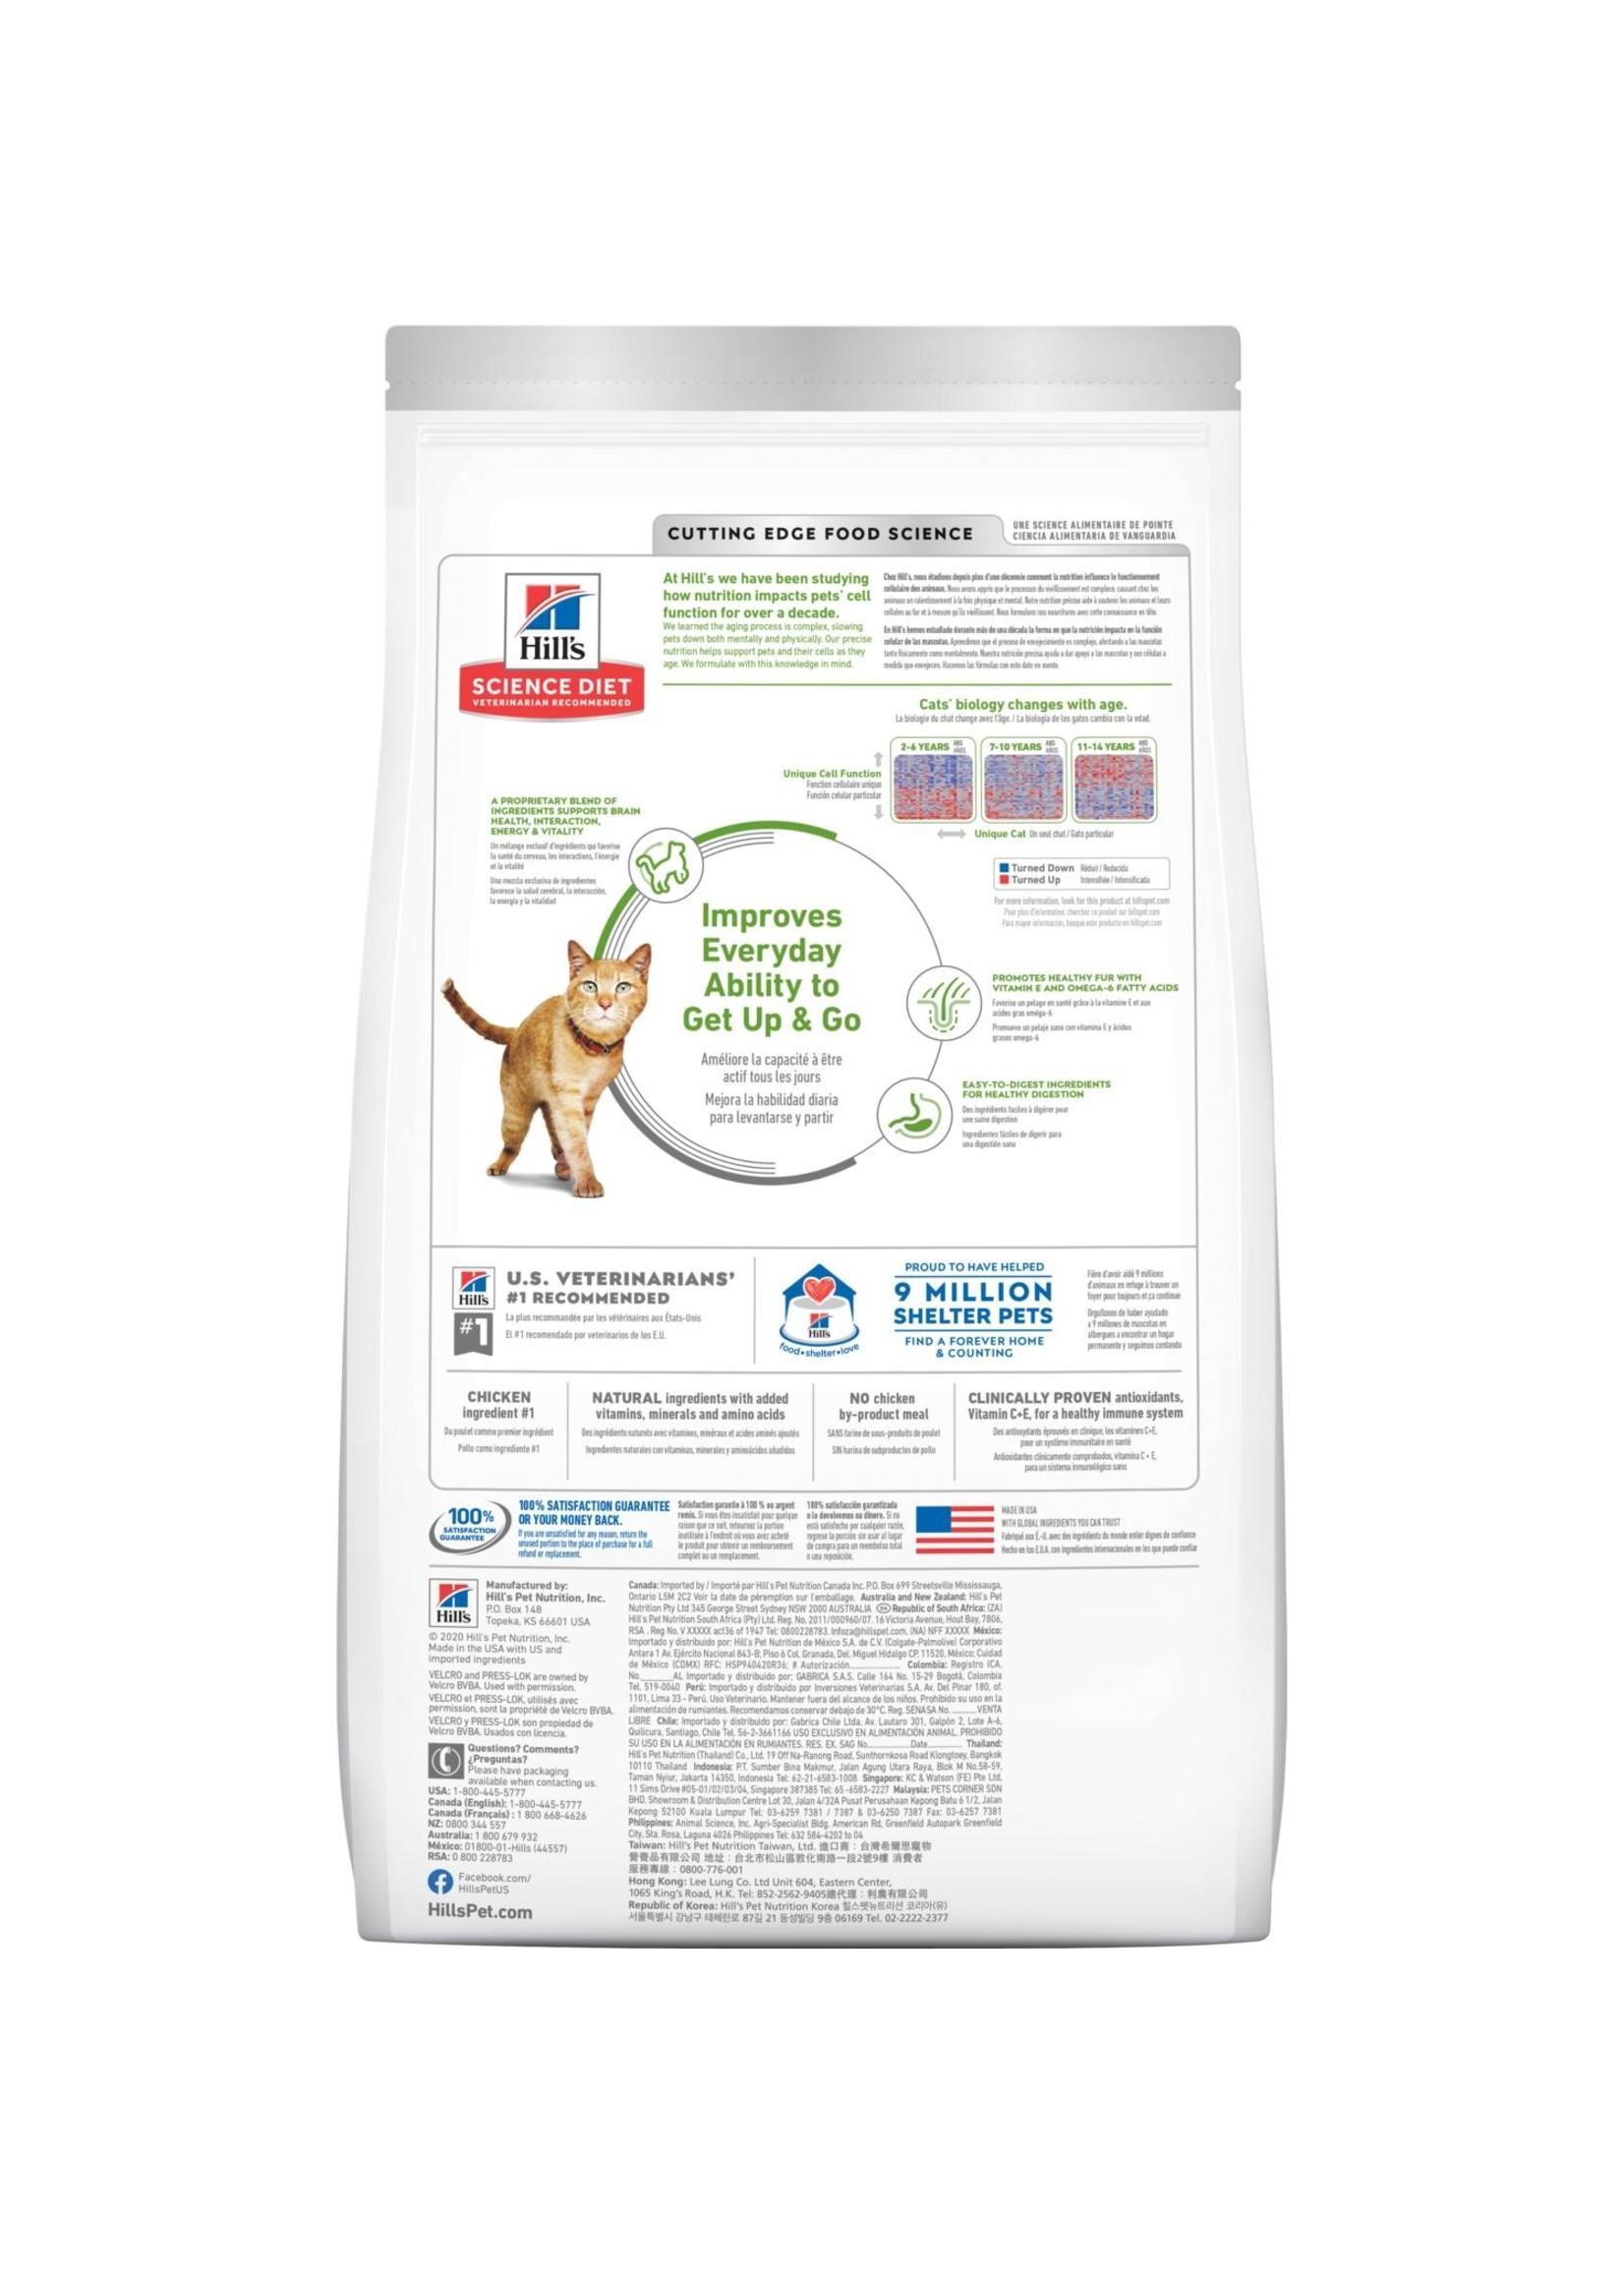 Hill's Science Diet Hill's Science Diet Senior 7+ Senior Vitality Dry Cat Food, Chicken & Rice Recipe 6lb Bag